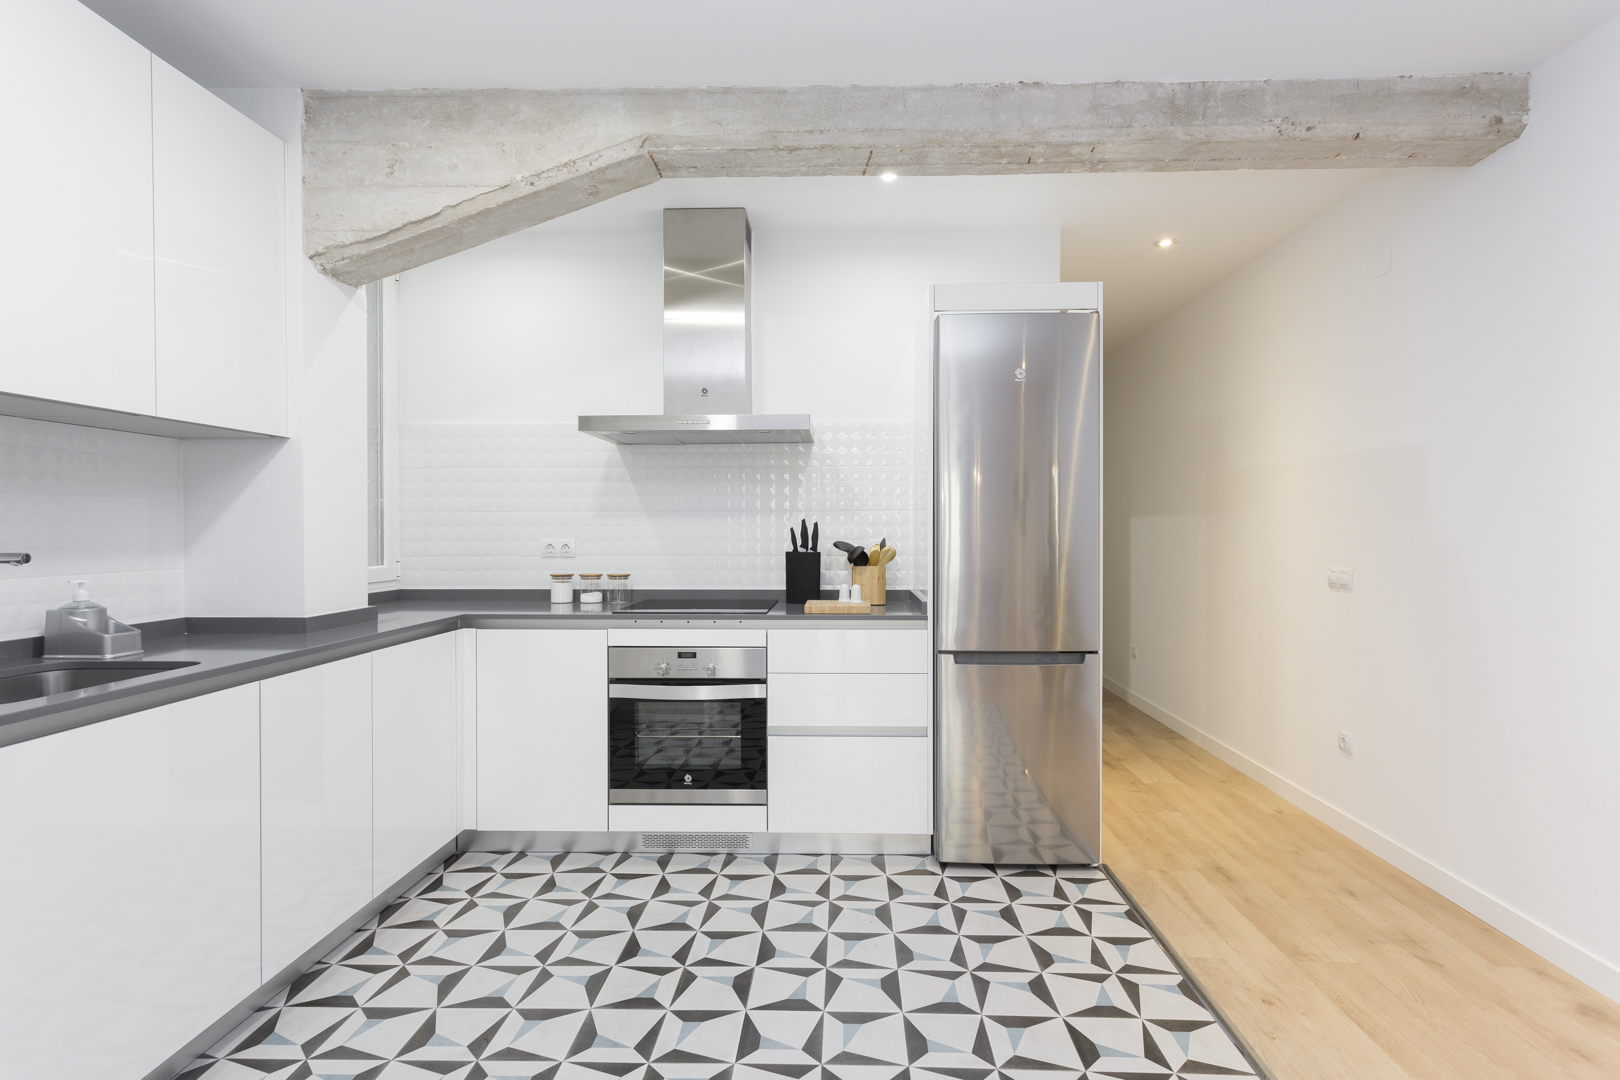 Kitchen at Calle Gravina Apartment, Centre, Madrid